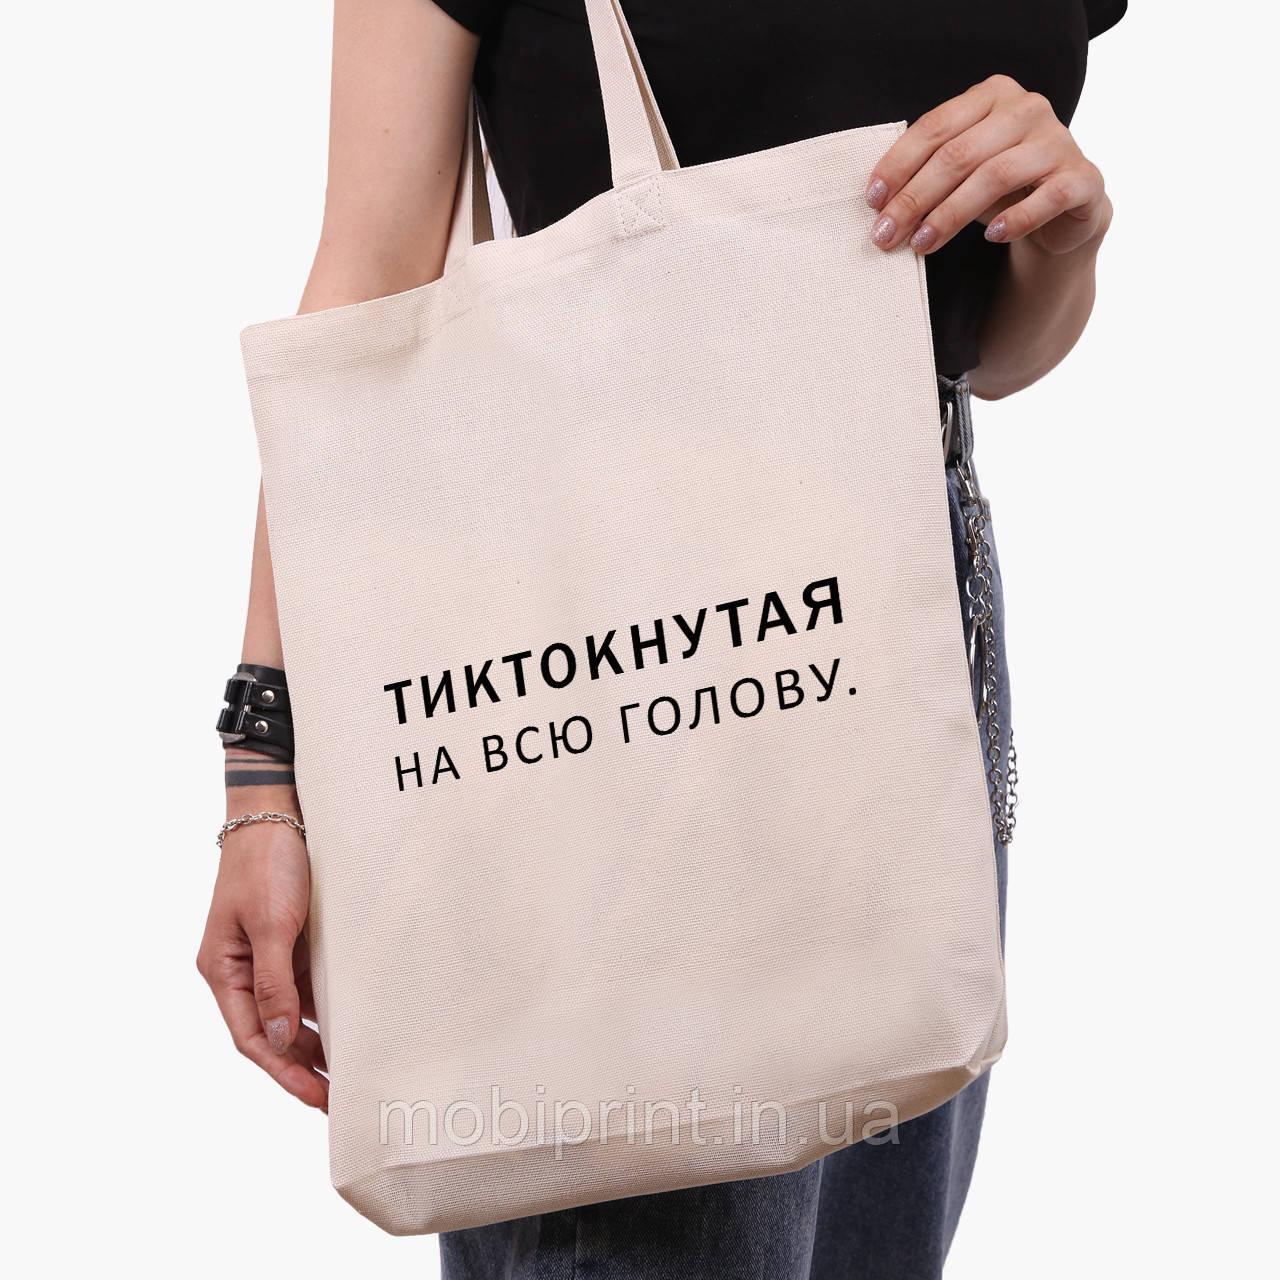 Эко сумка шоппер белая Тиктокнутая (9227-1793-1) экосумка шопер 41*39*8 см